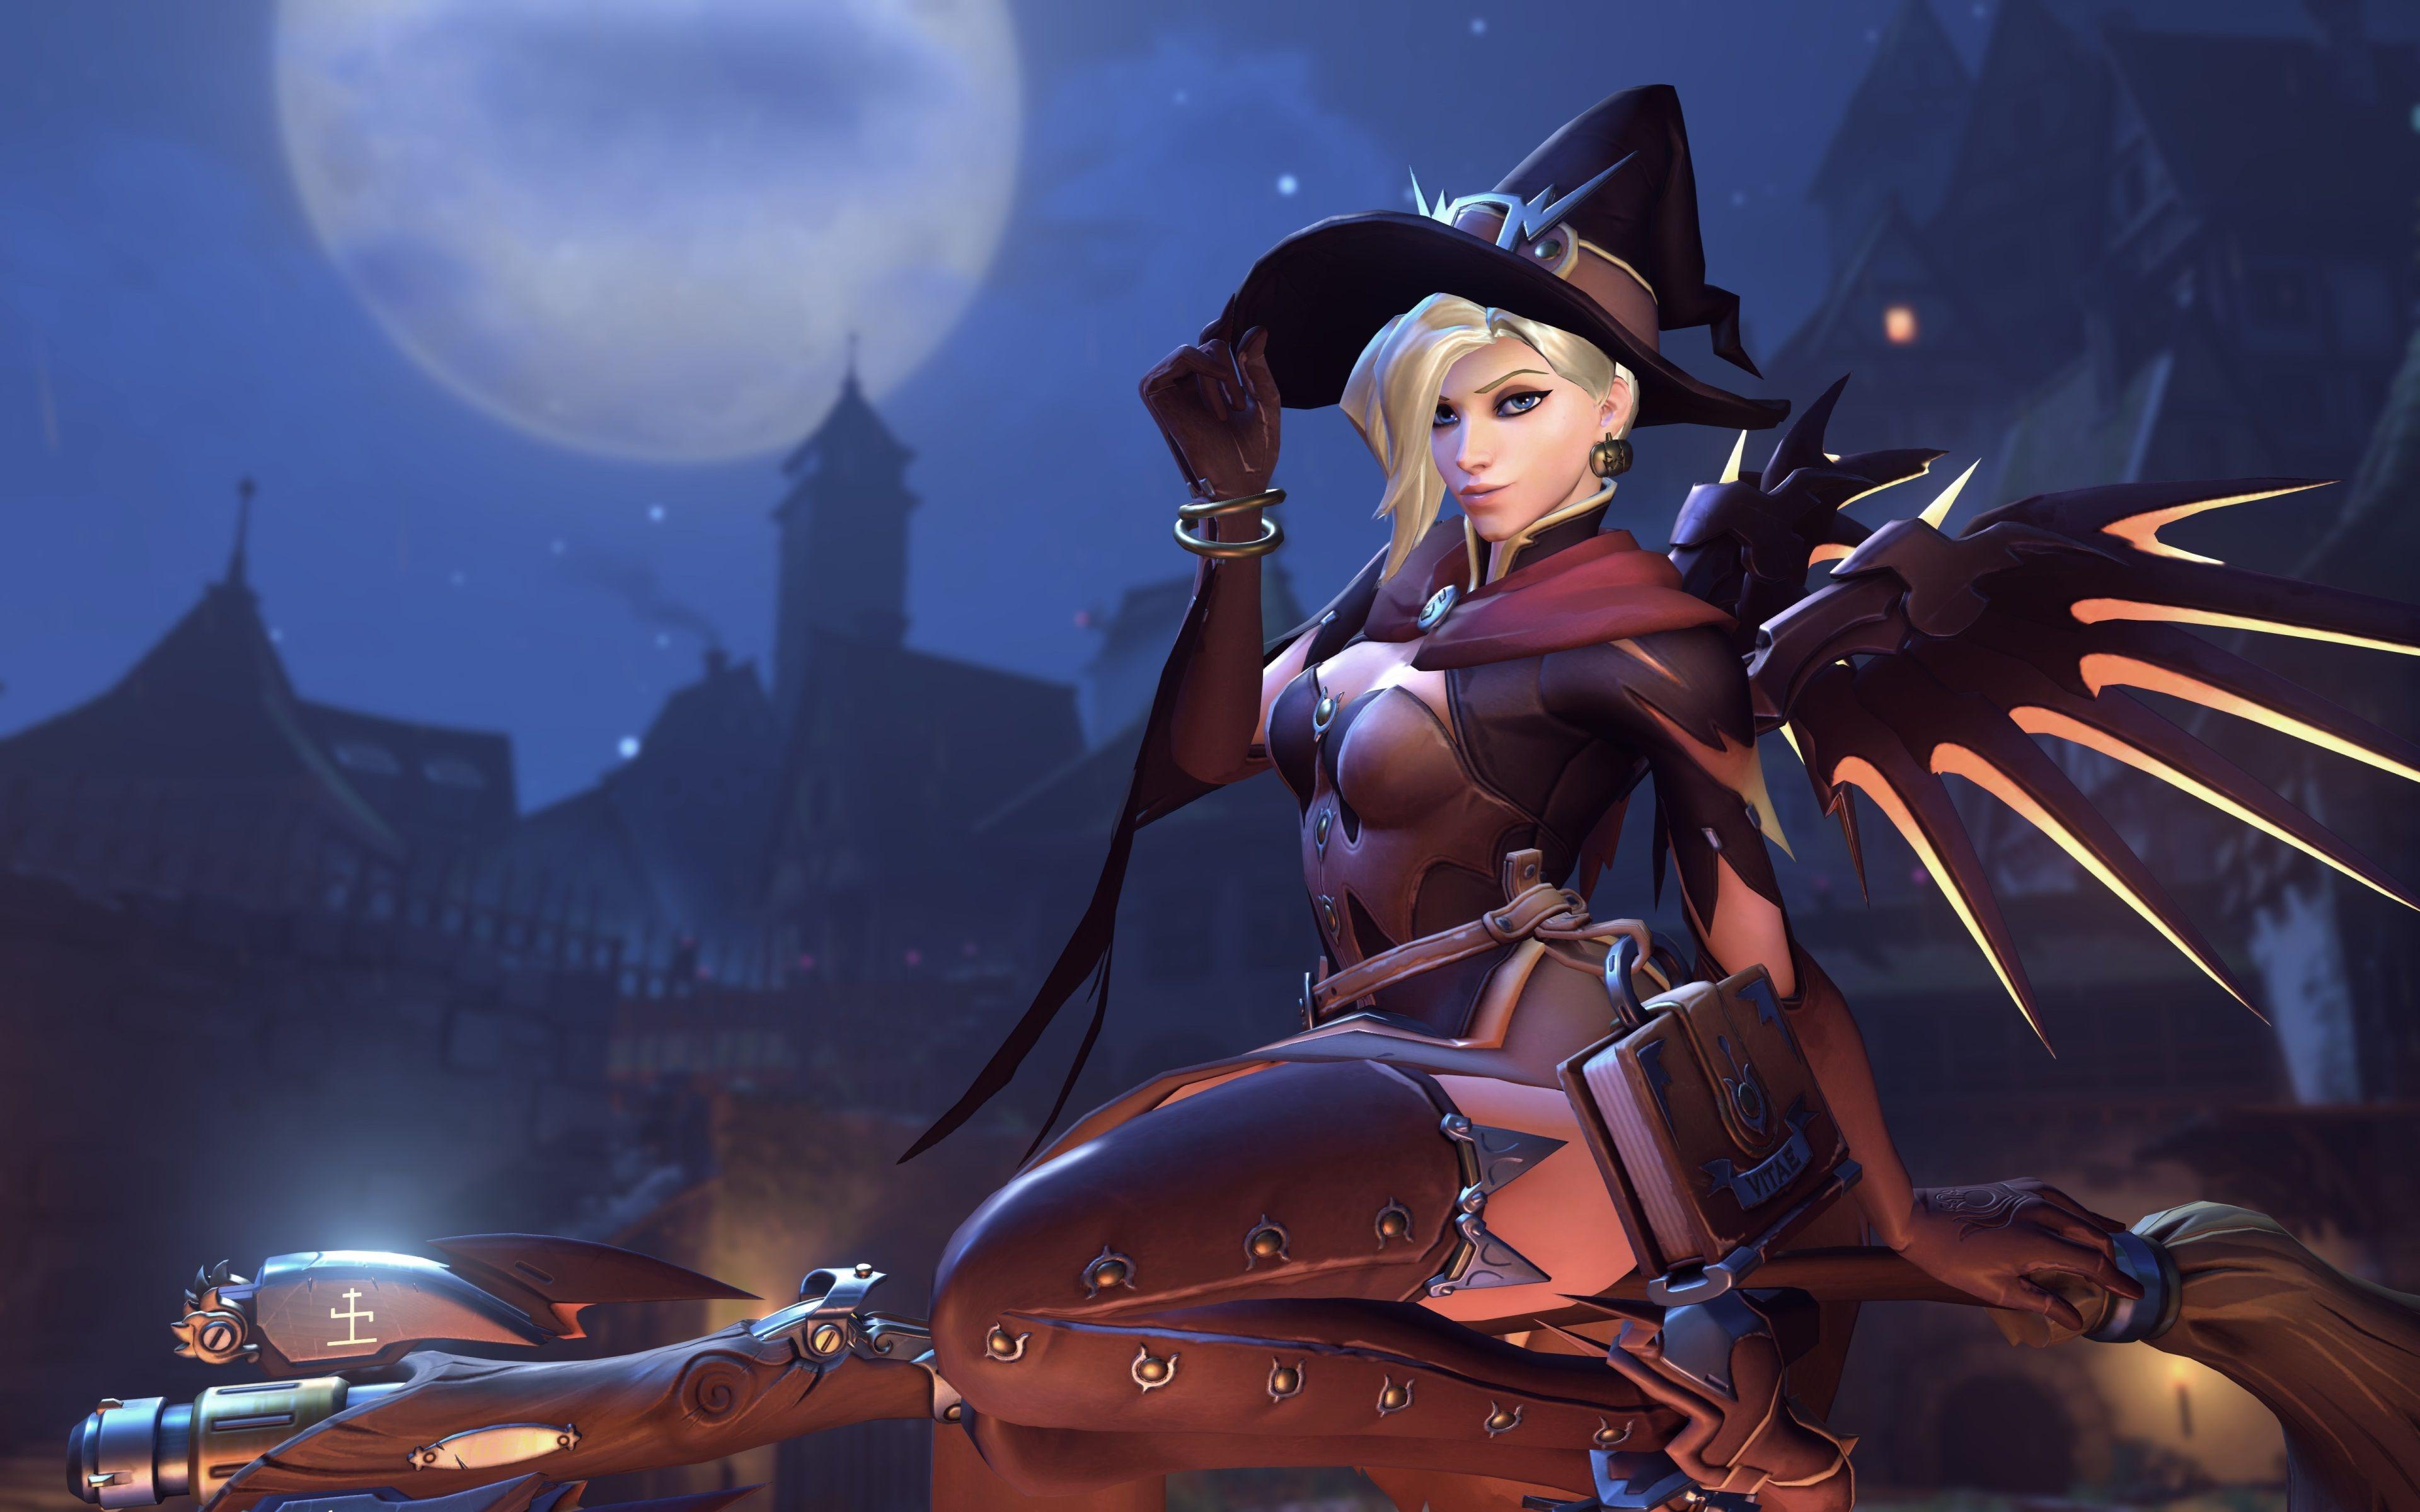 3840x2400 Mercy Overwatch 4k Full Hd Pic Mercy Overwatch Overwatch Mercy Witch